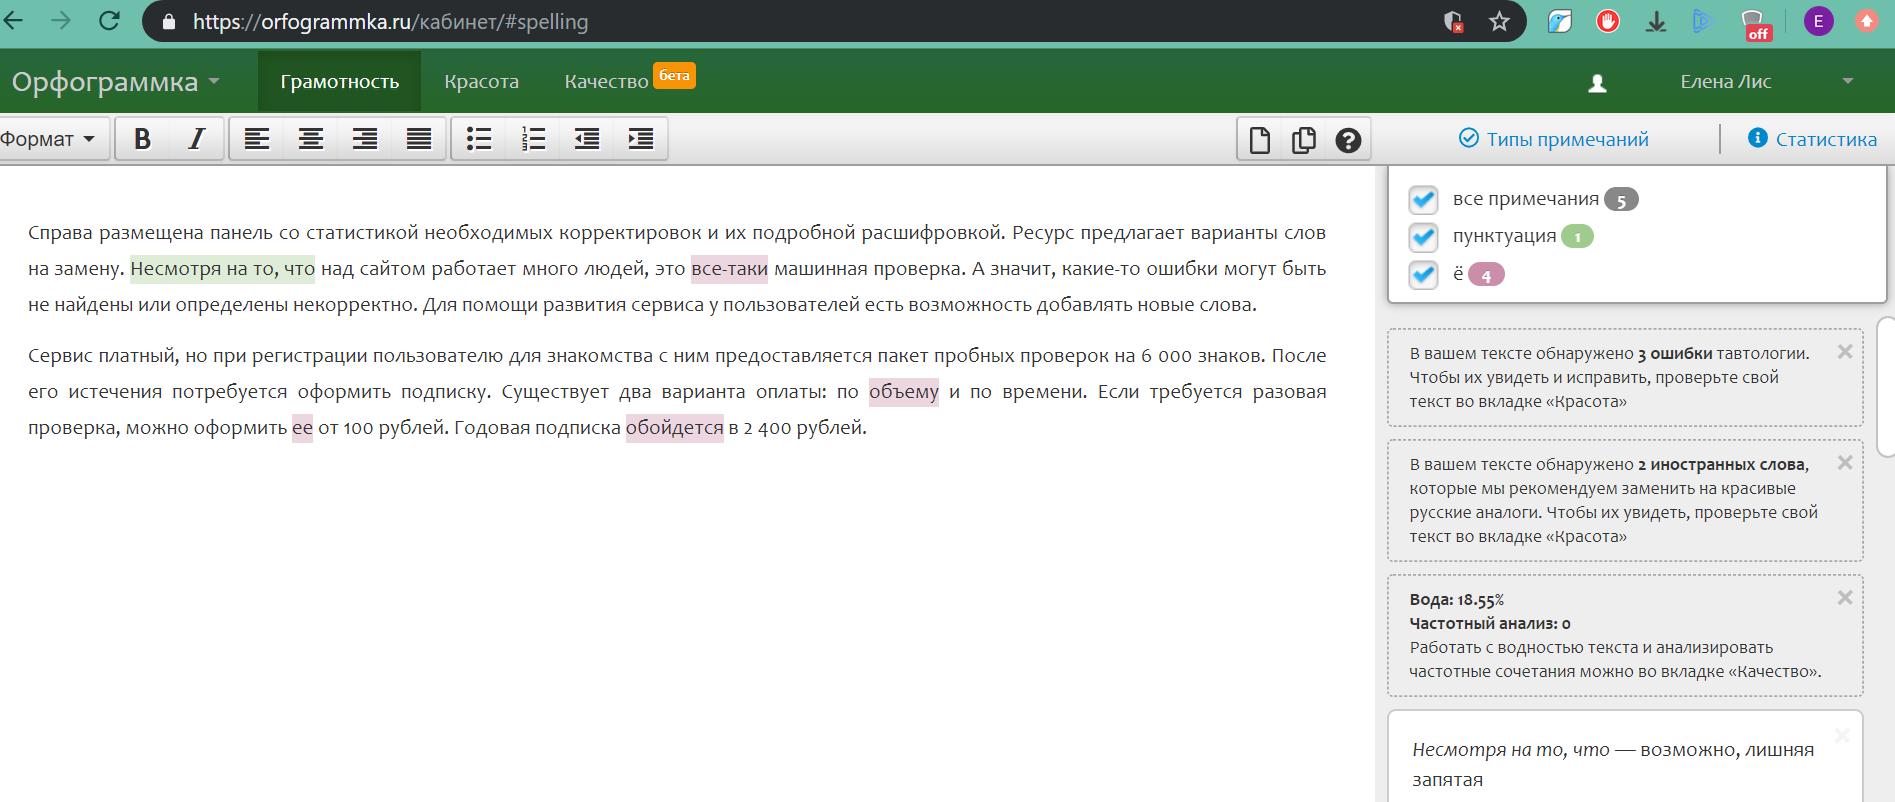 Пример проверки текста в сервисе Орфограммка